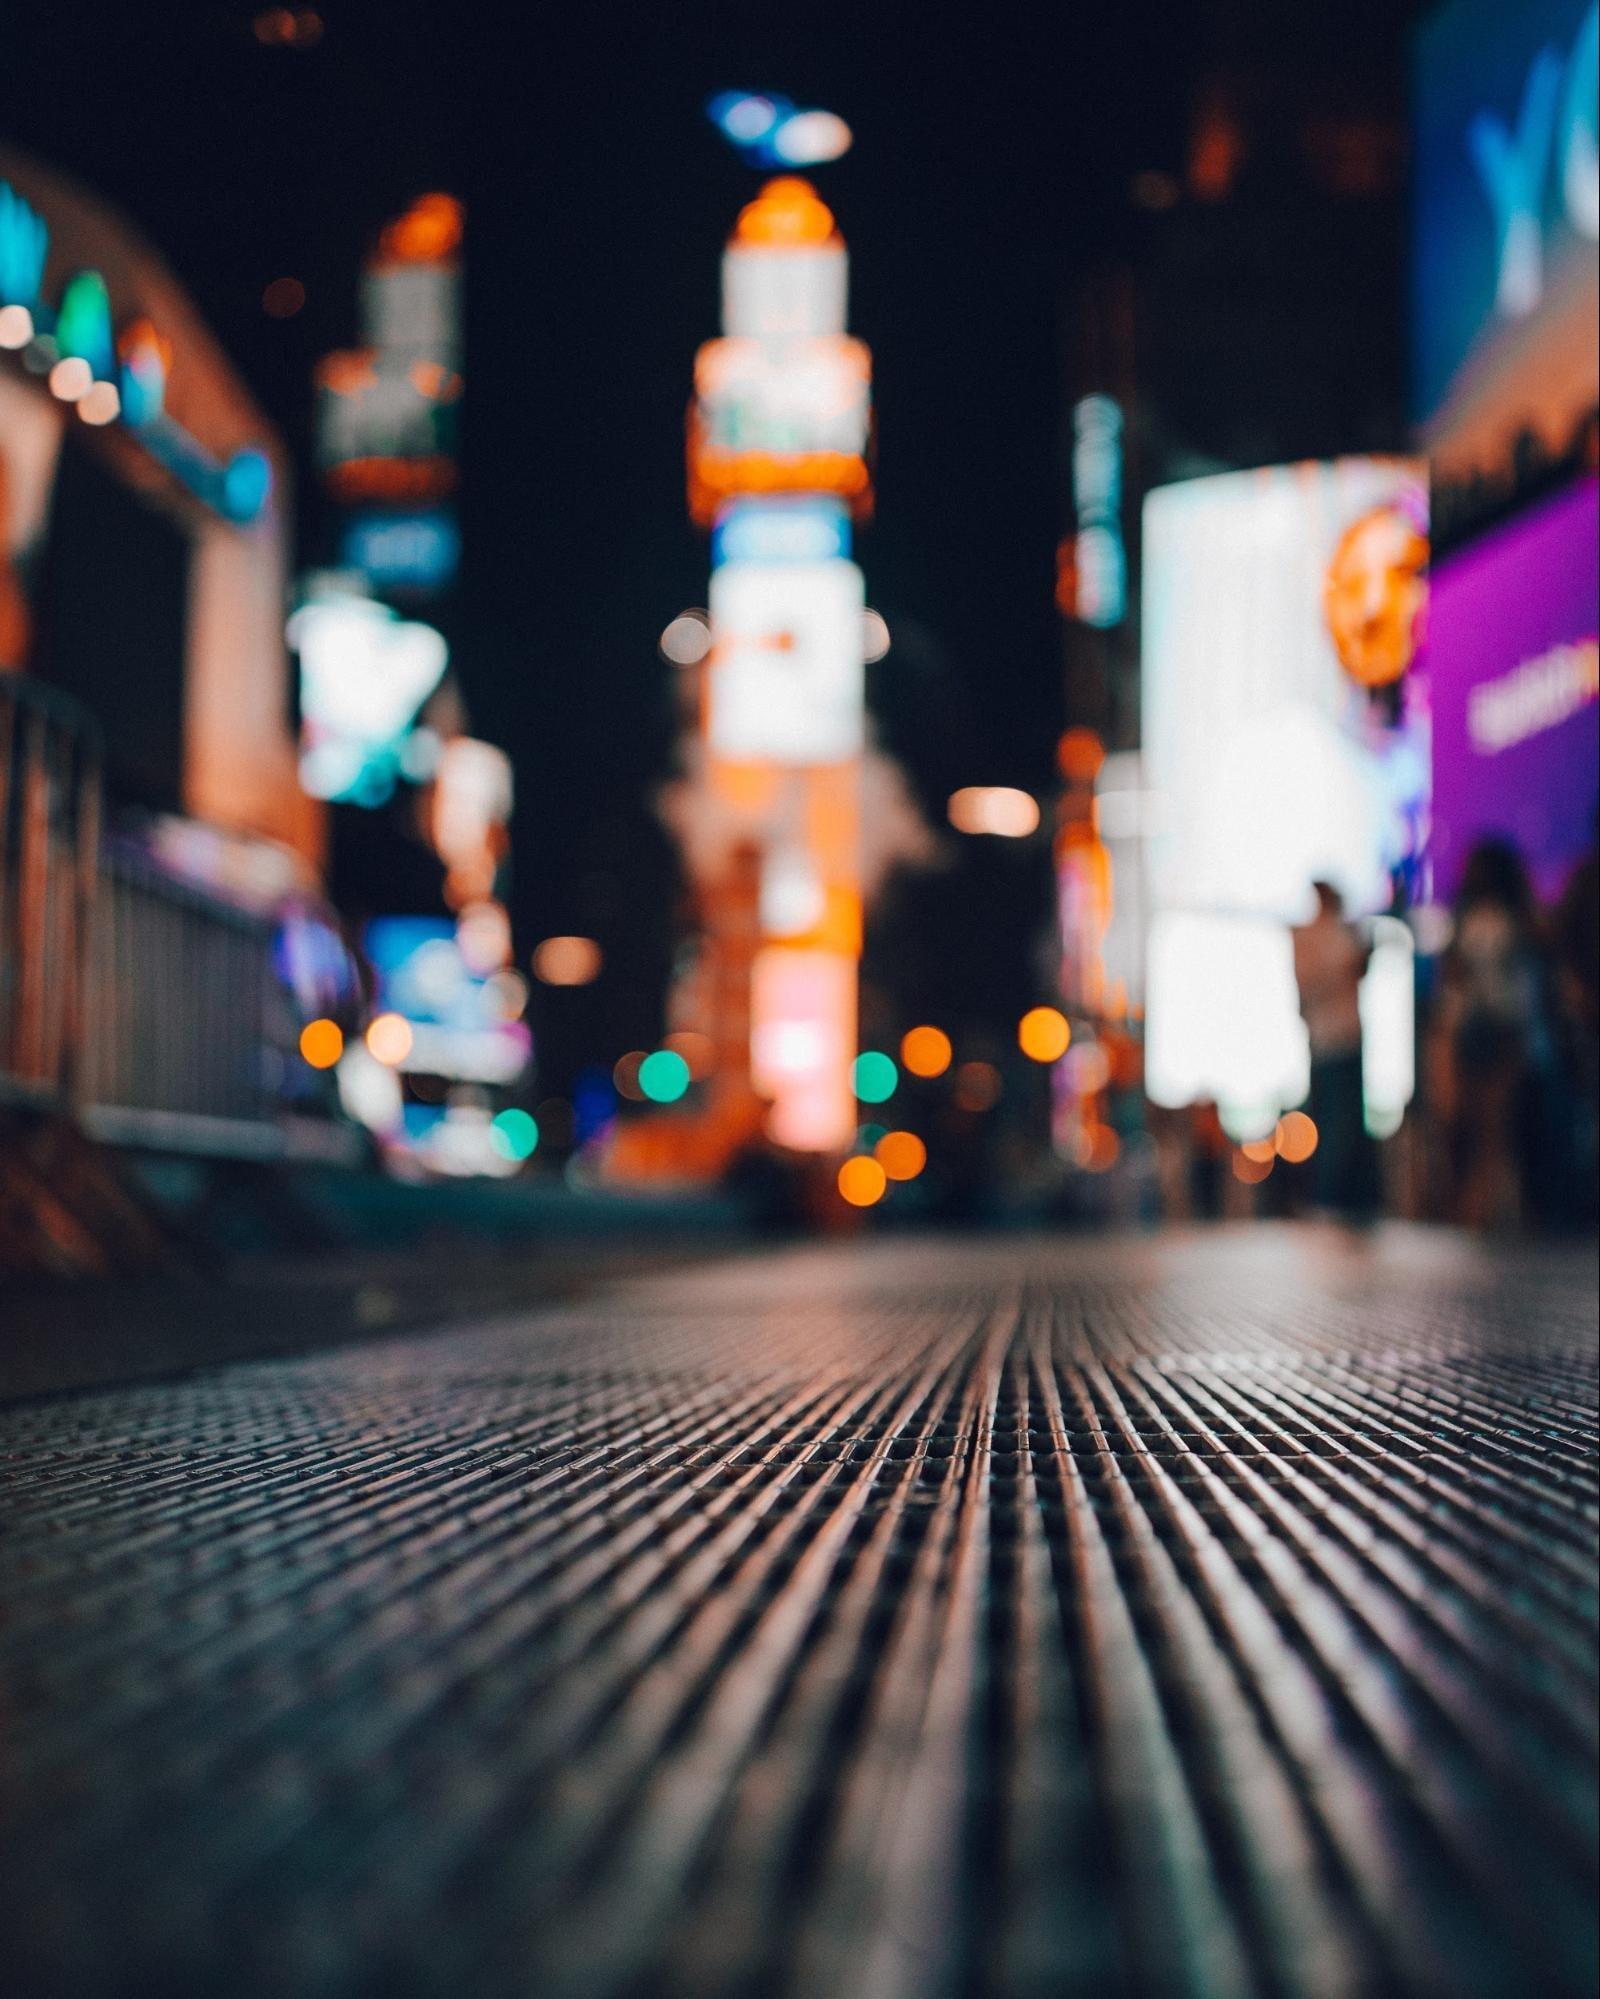 City lights background bokeh